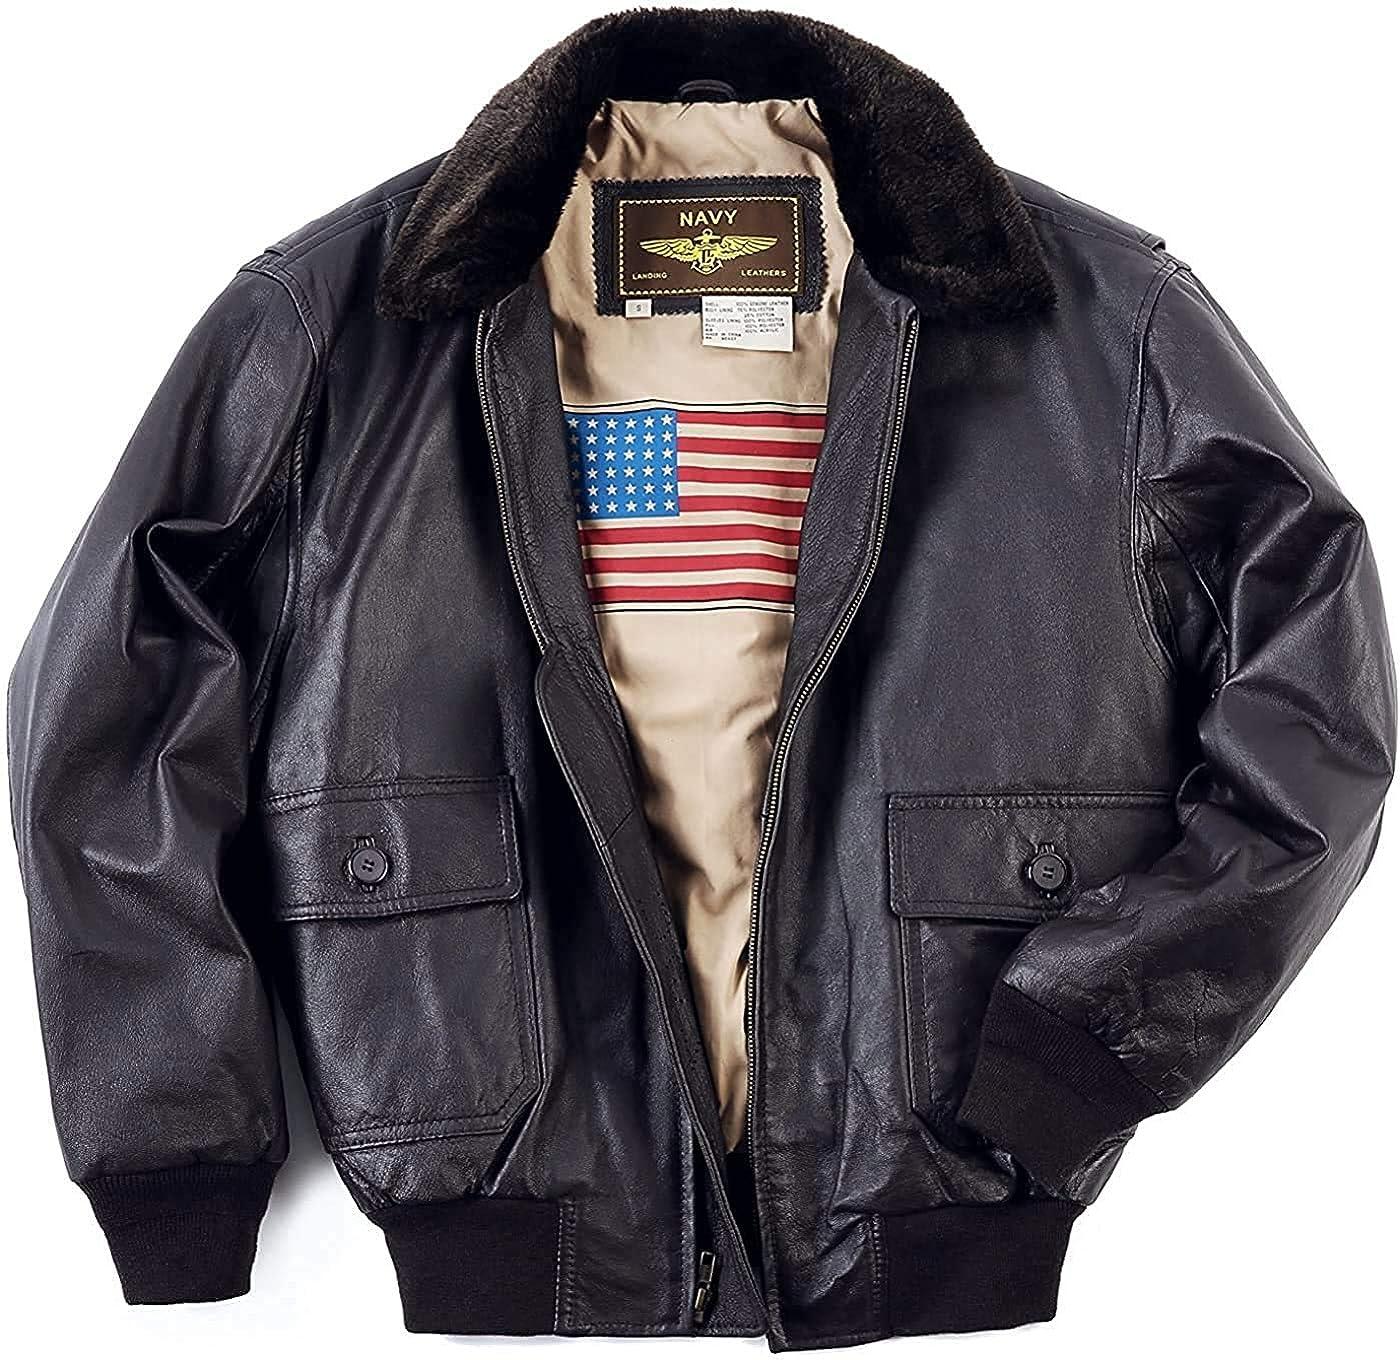 Bless By Design Men's Navy G-1 Leather Flight Fashion Fur Collar Bomber Jacket WWII U.S Flag Lining Jacket for Men